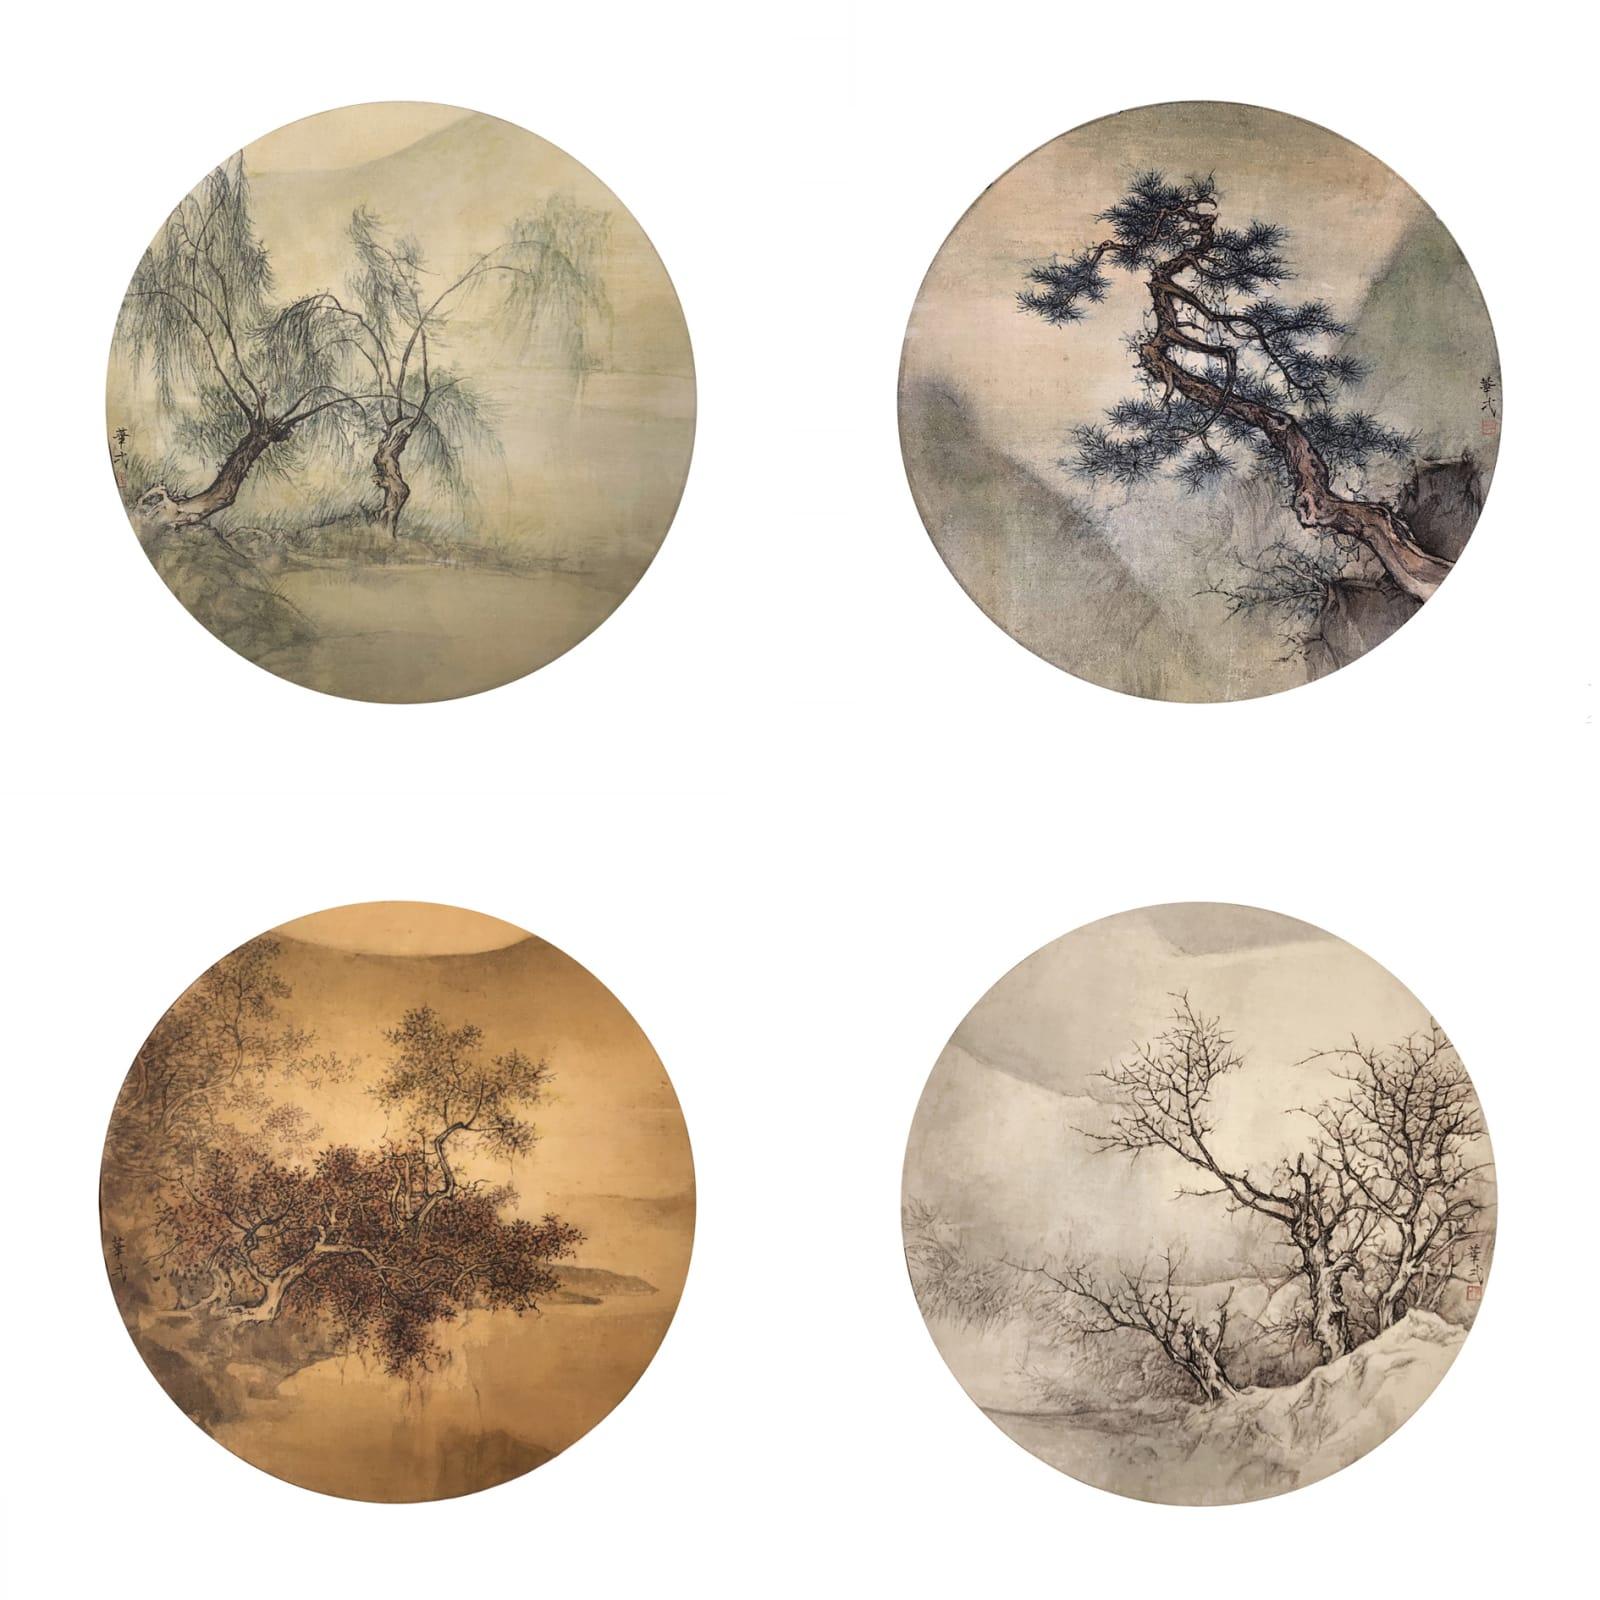 Li Huayi 李華弌, Ballad of Seasons《四時行》, 2018